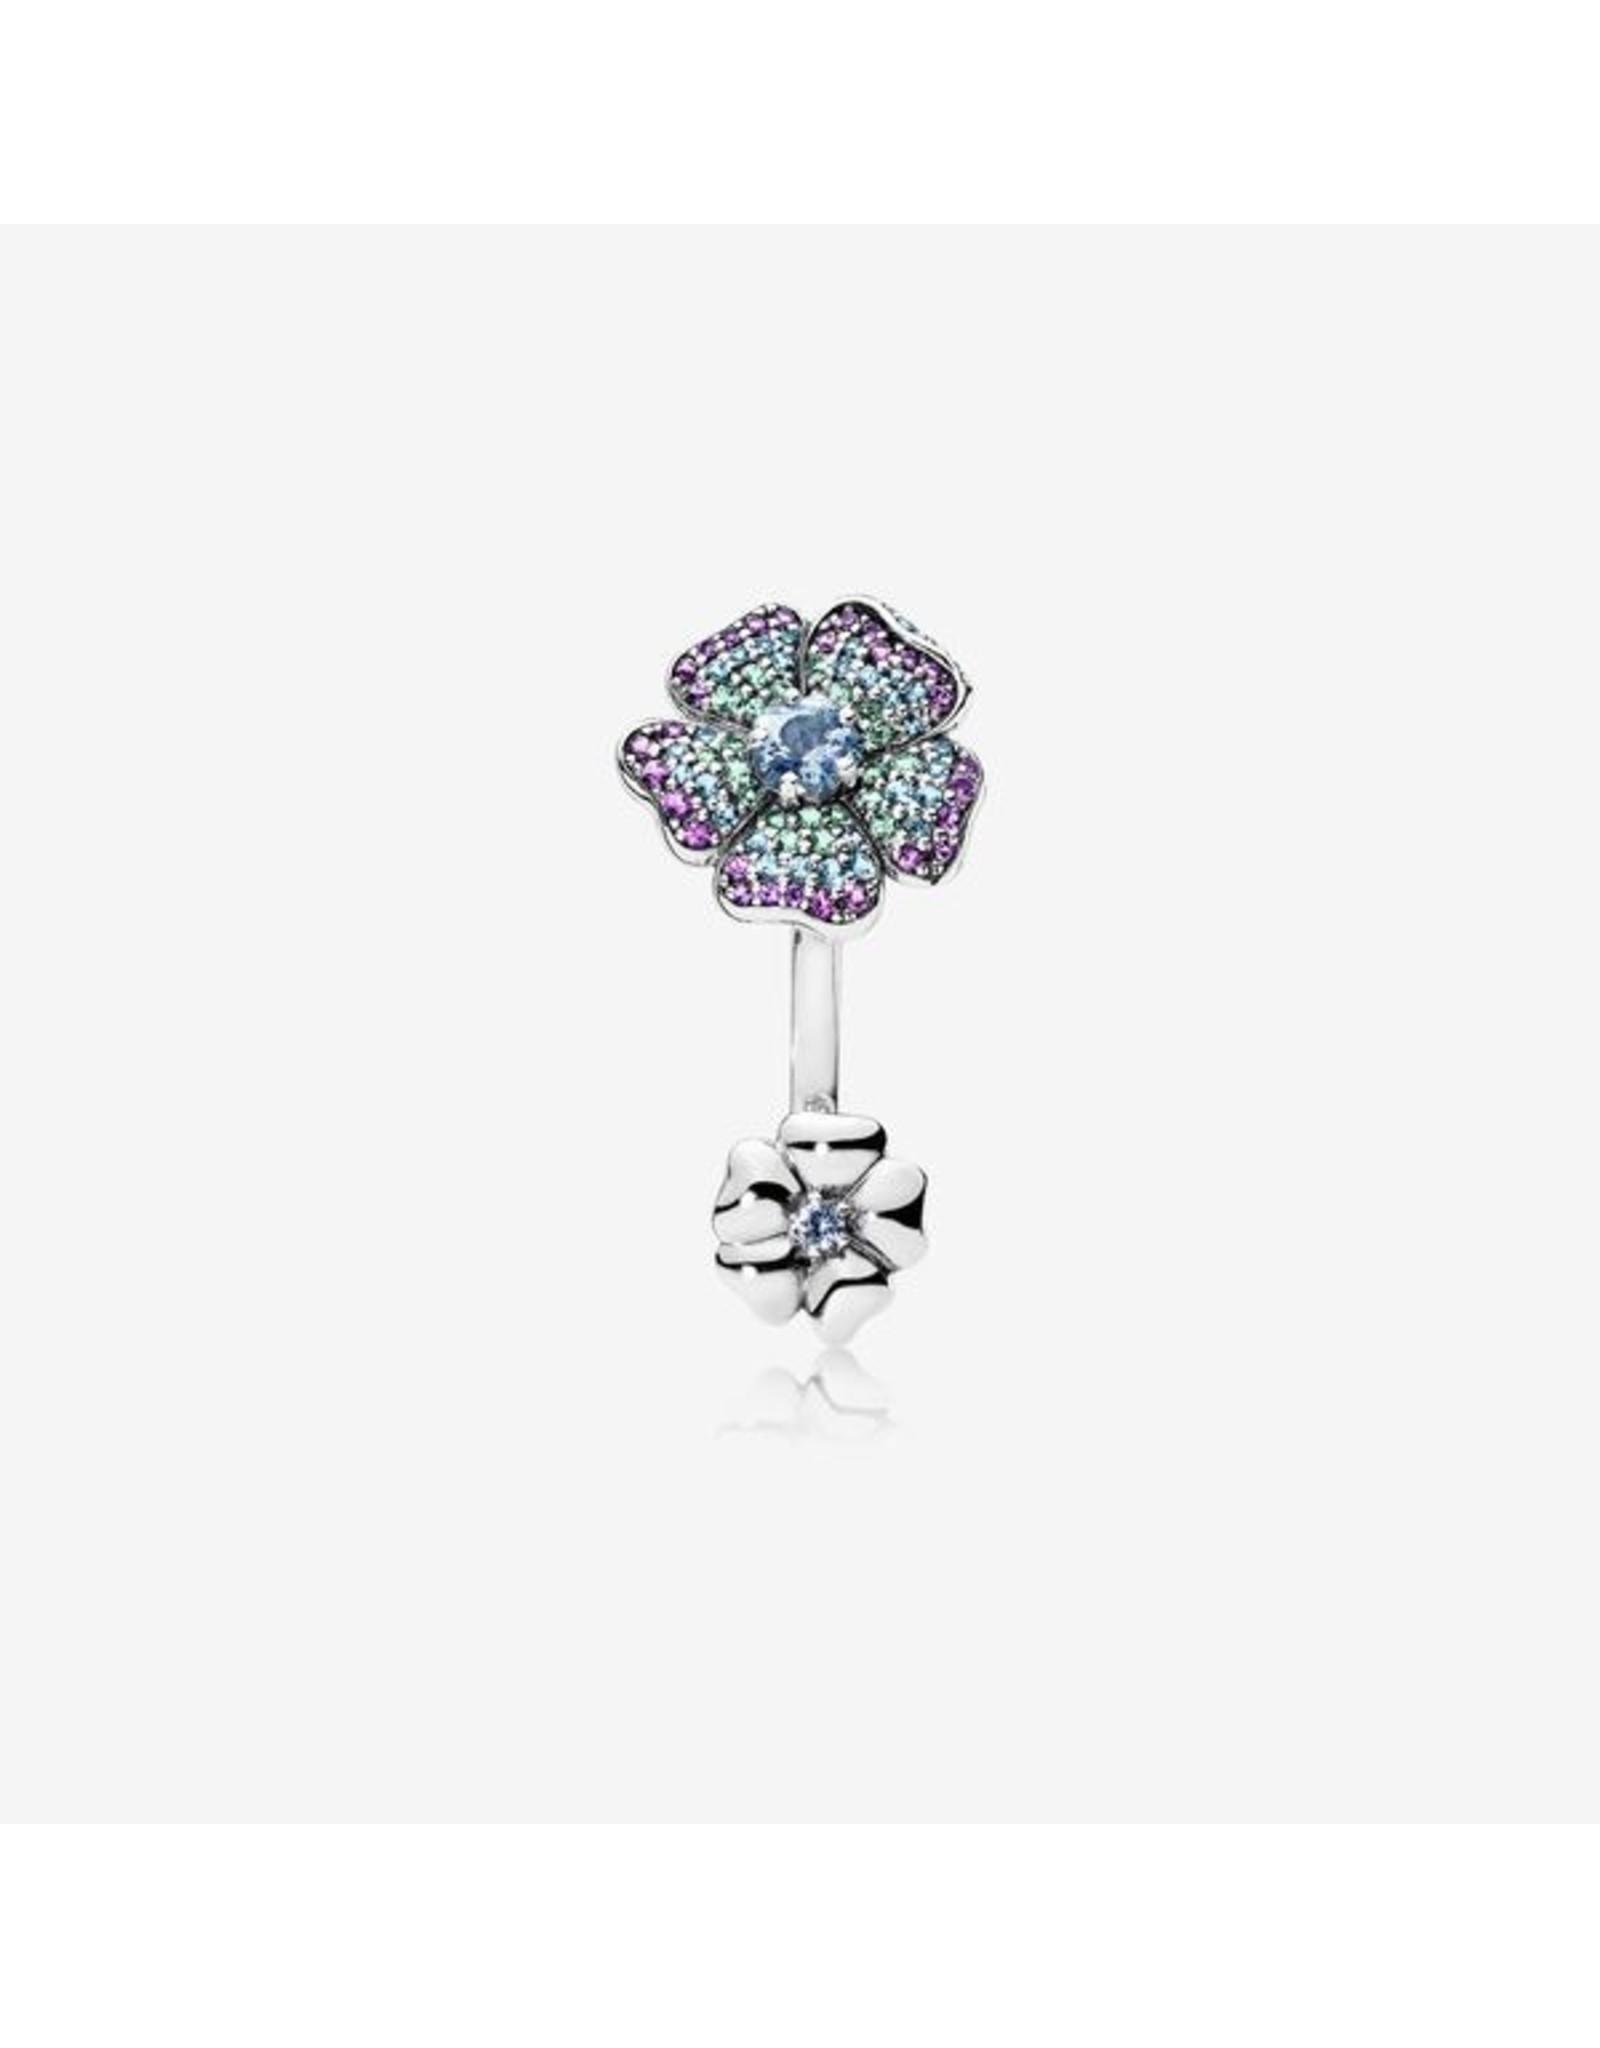 Pandora Pandora Ring, Glorious Blooms, Multi-Colored CZ